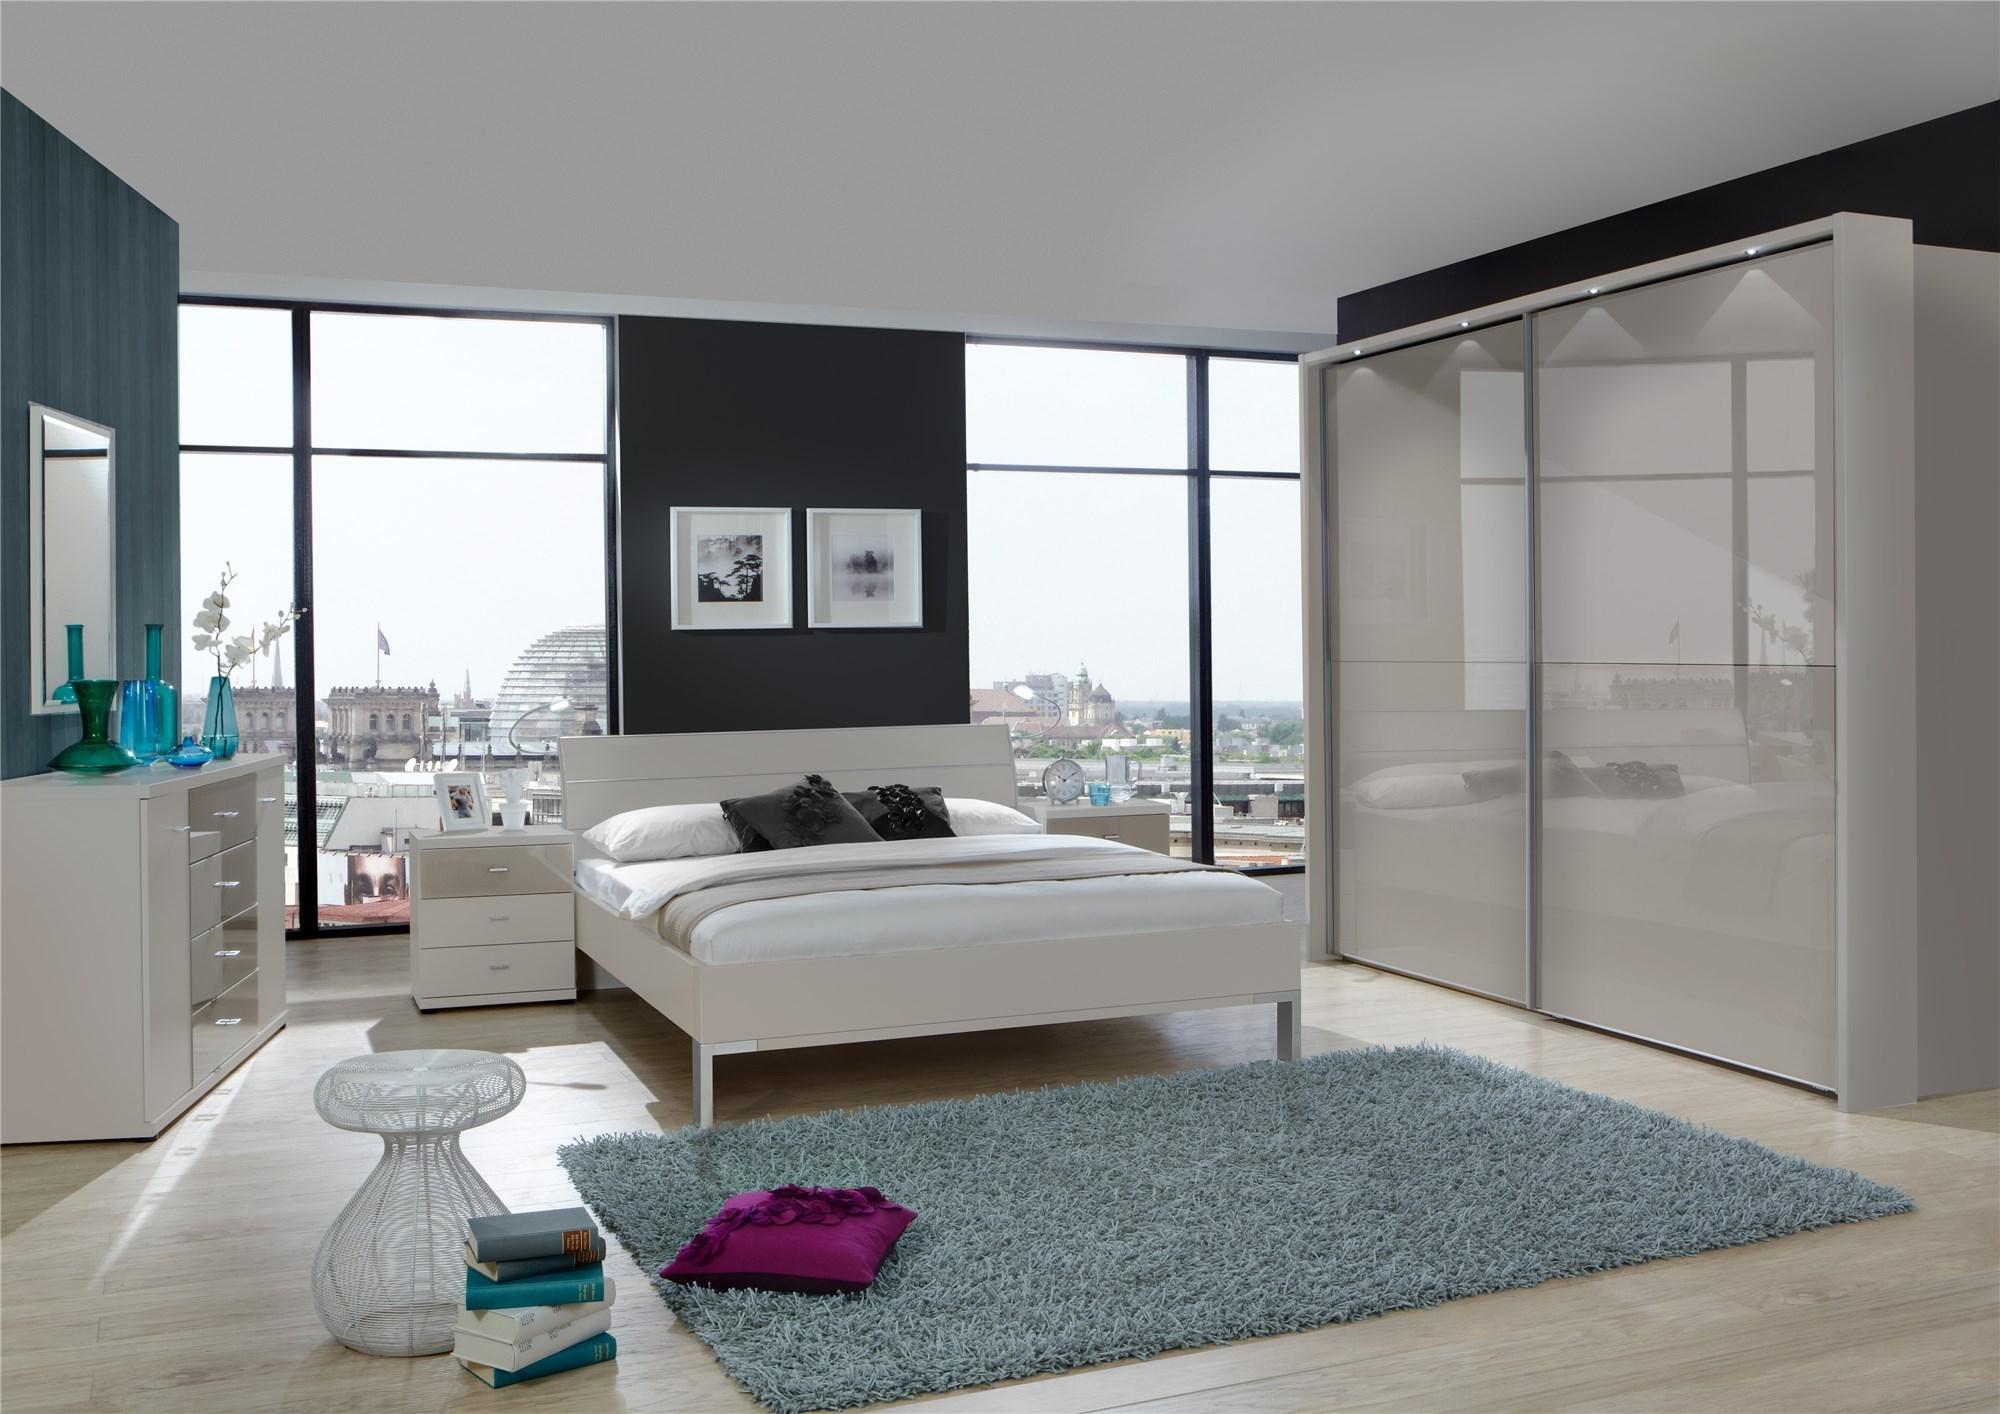 Stylform Linus Bedroom Set Sliding Door Bedroom Furniture Sets Head2bed Uk